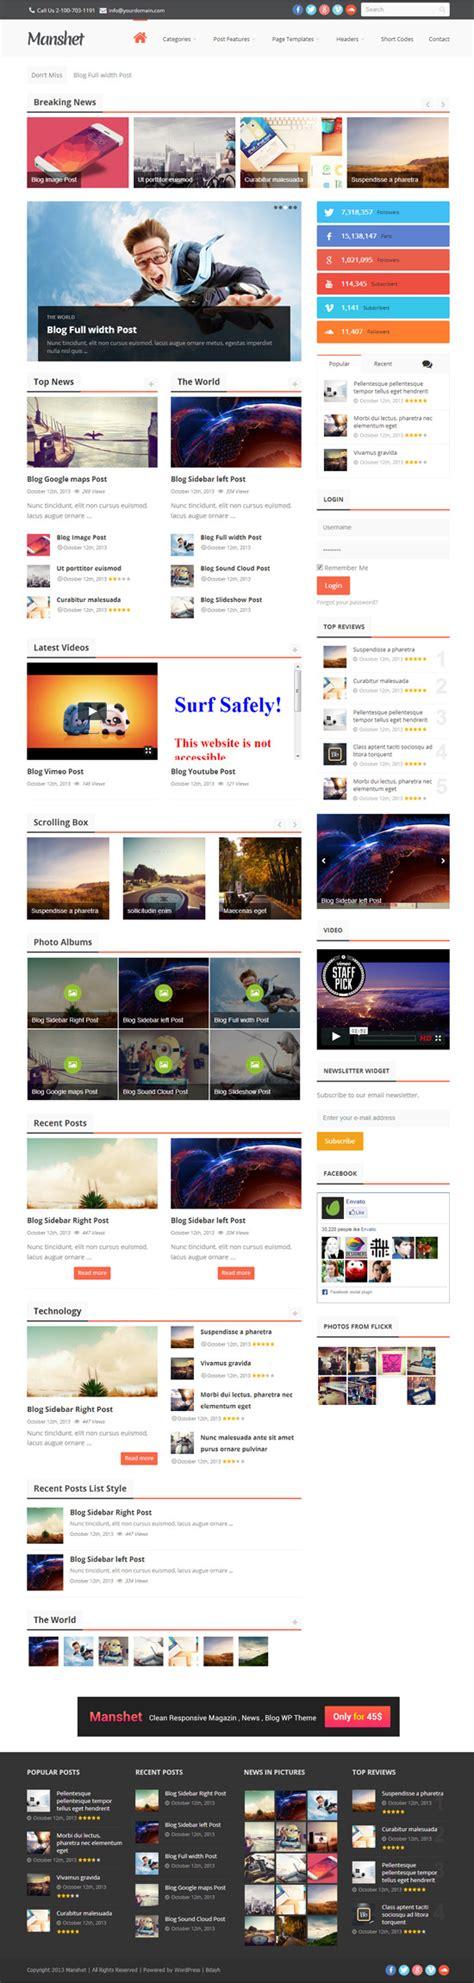 wordpress news layout responsive wordpress news magazine themes wordpress